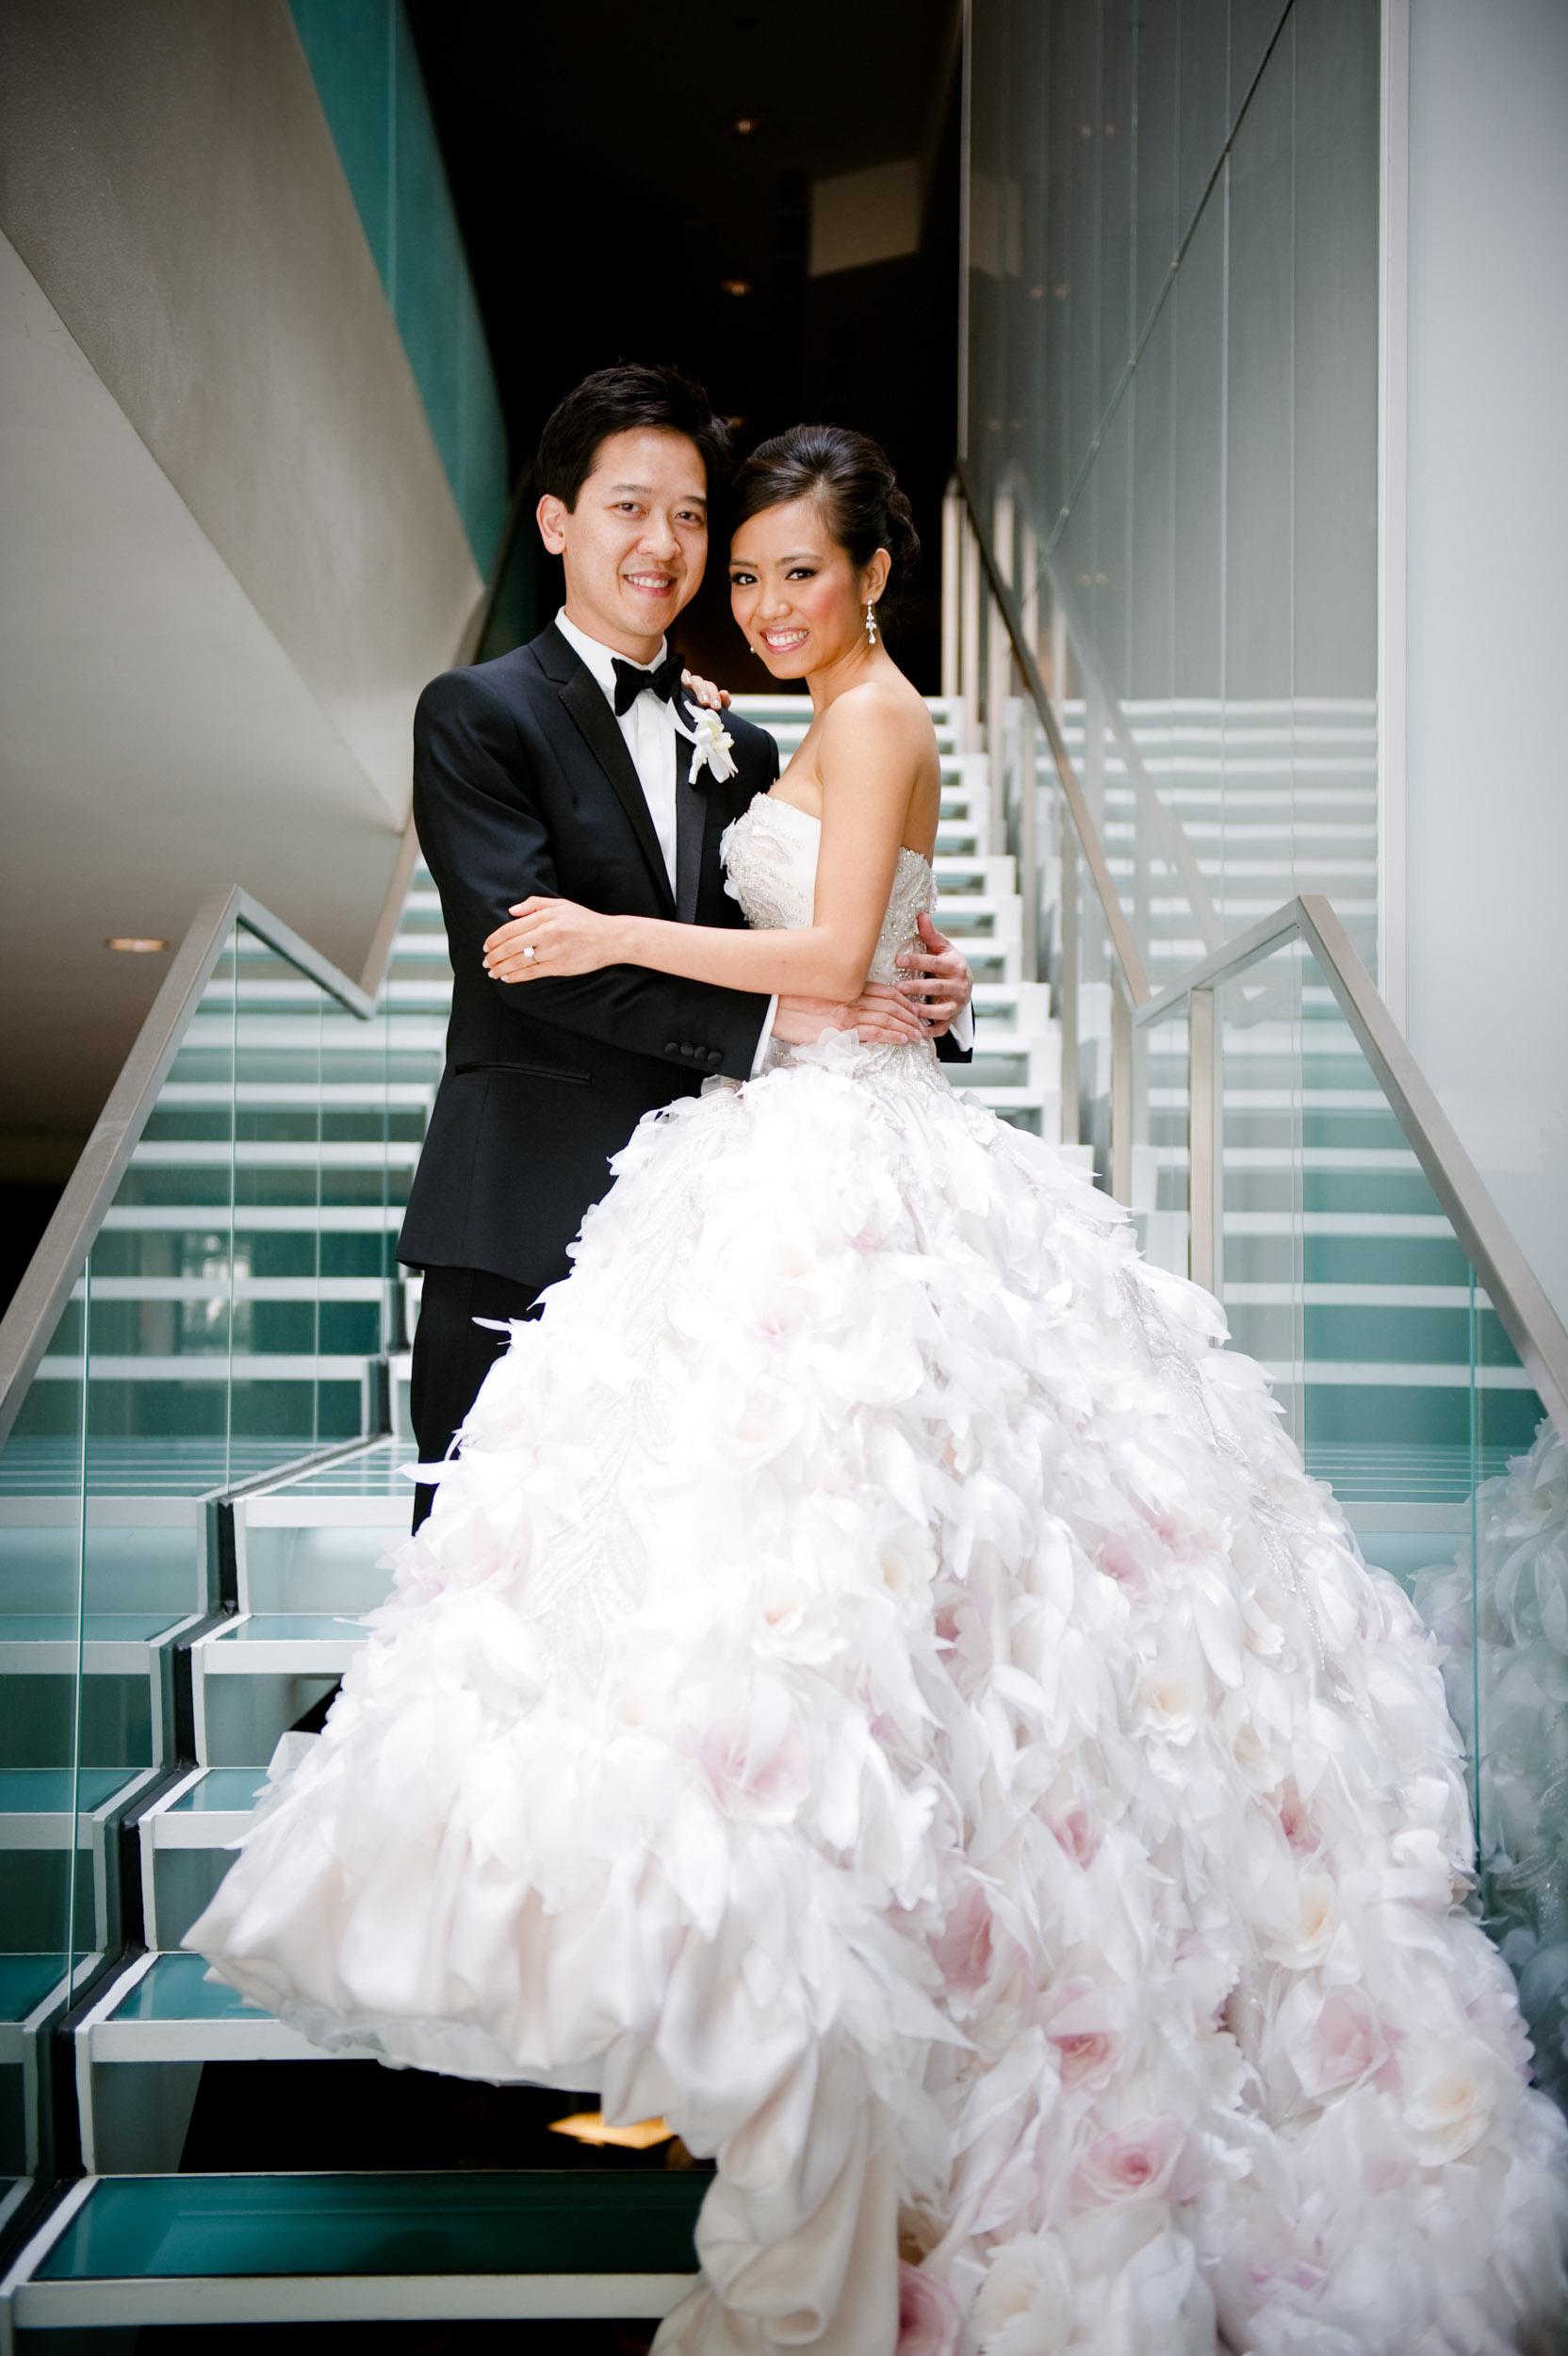 sofitel-chicago-wedding-photographer-chicago-22.jpg